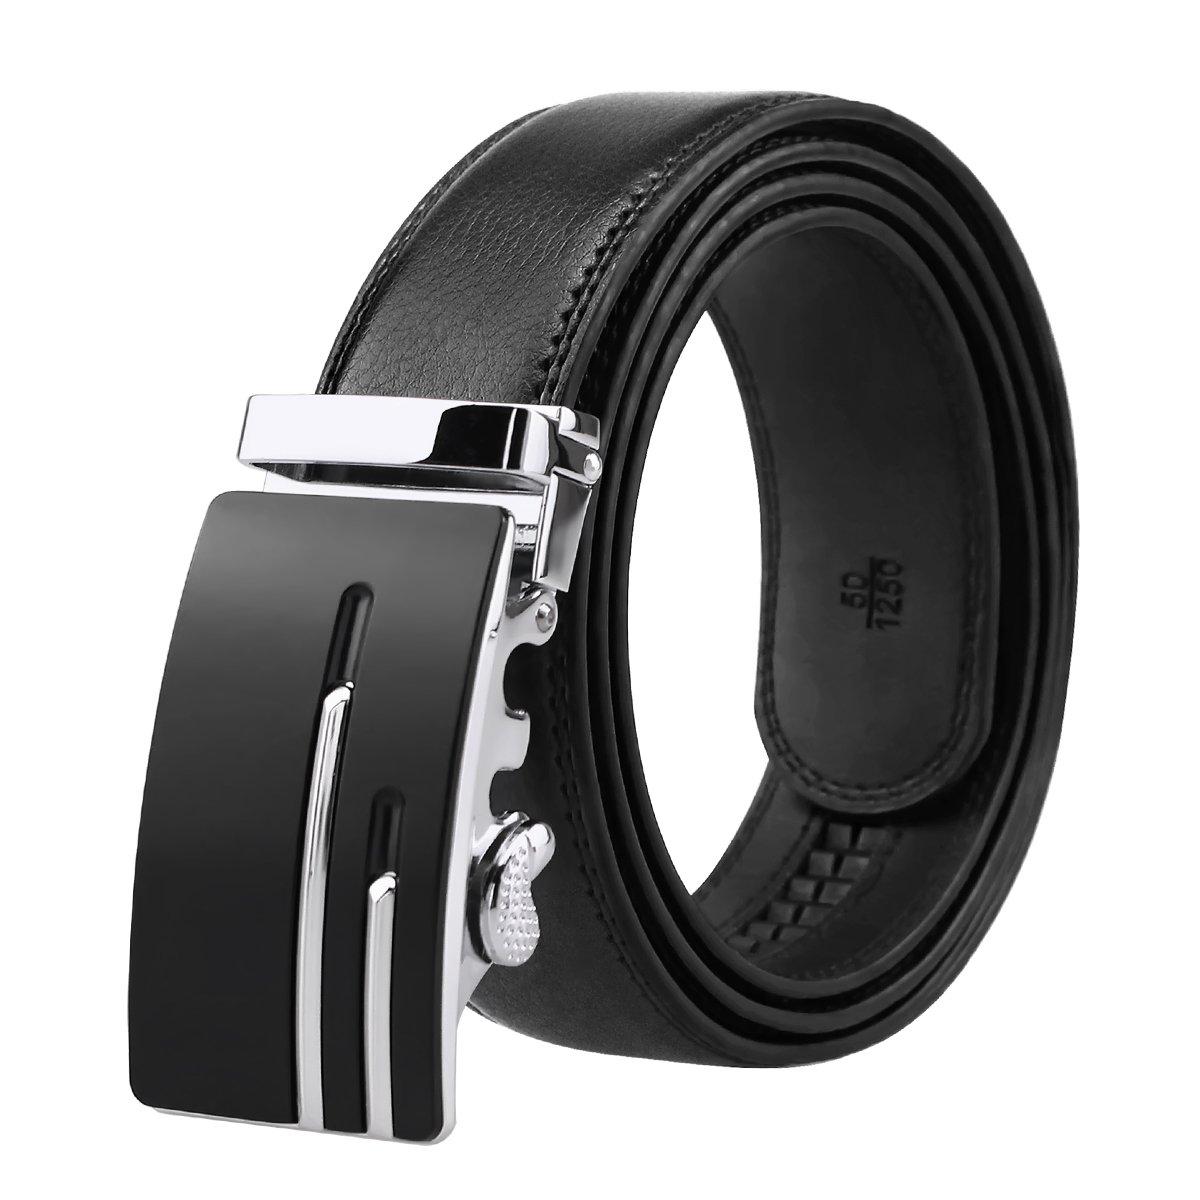 Men's Genuine Leather Ratchet Belt Black Dress Belt with Automatic Buckle 1 3/8 Wide Gift Box